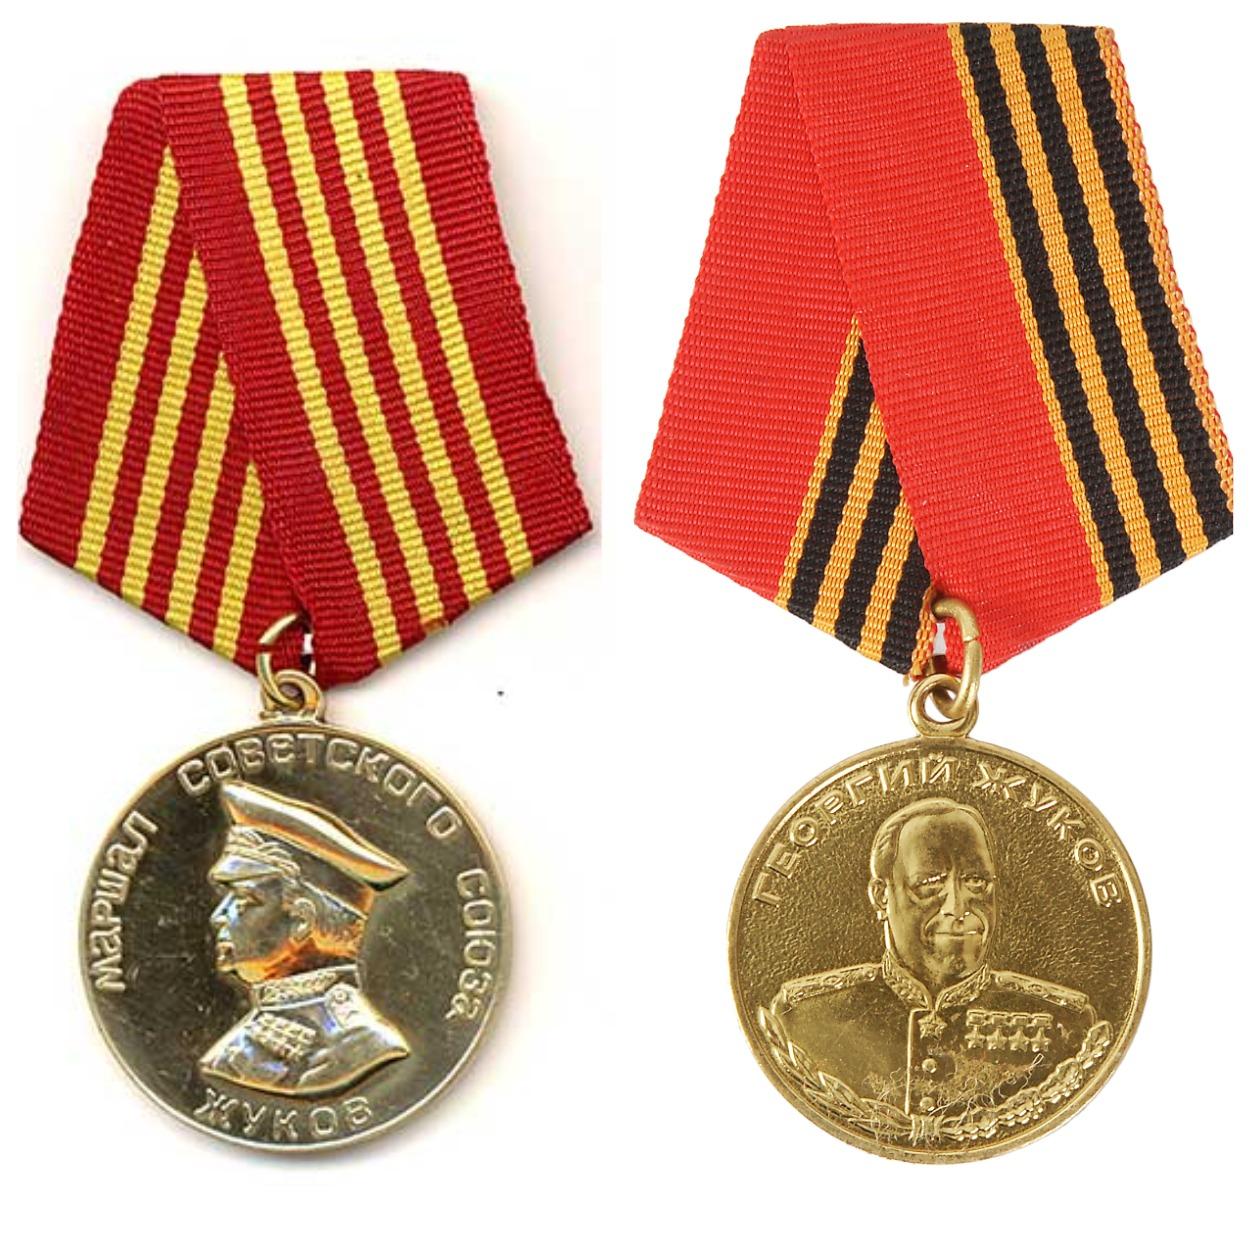 Two varieties of Zhukov's medal.